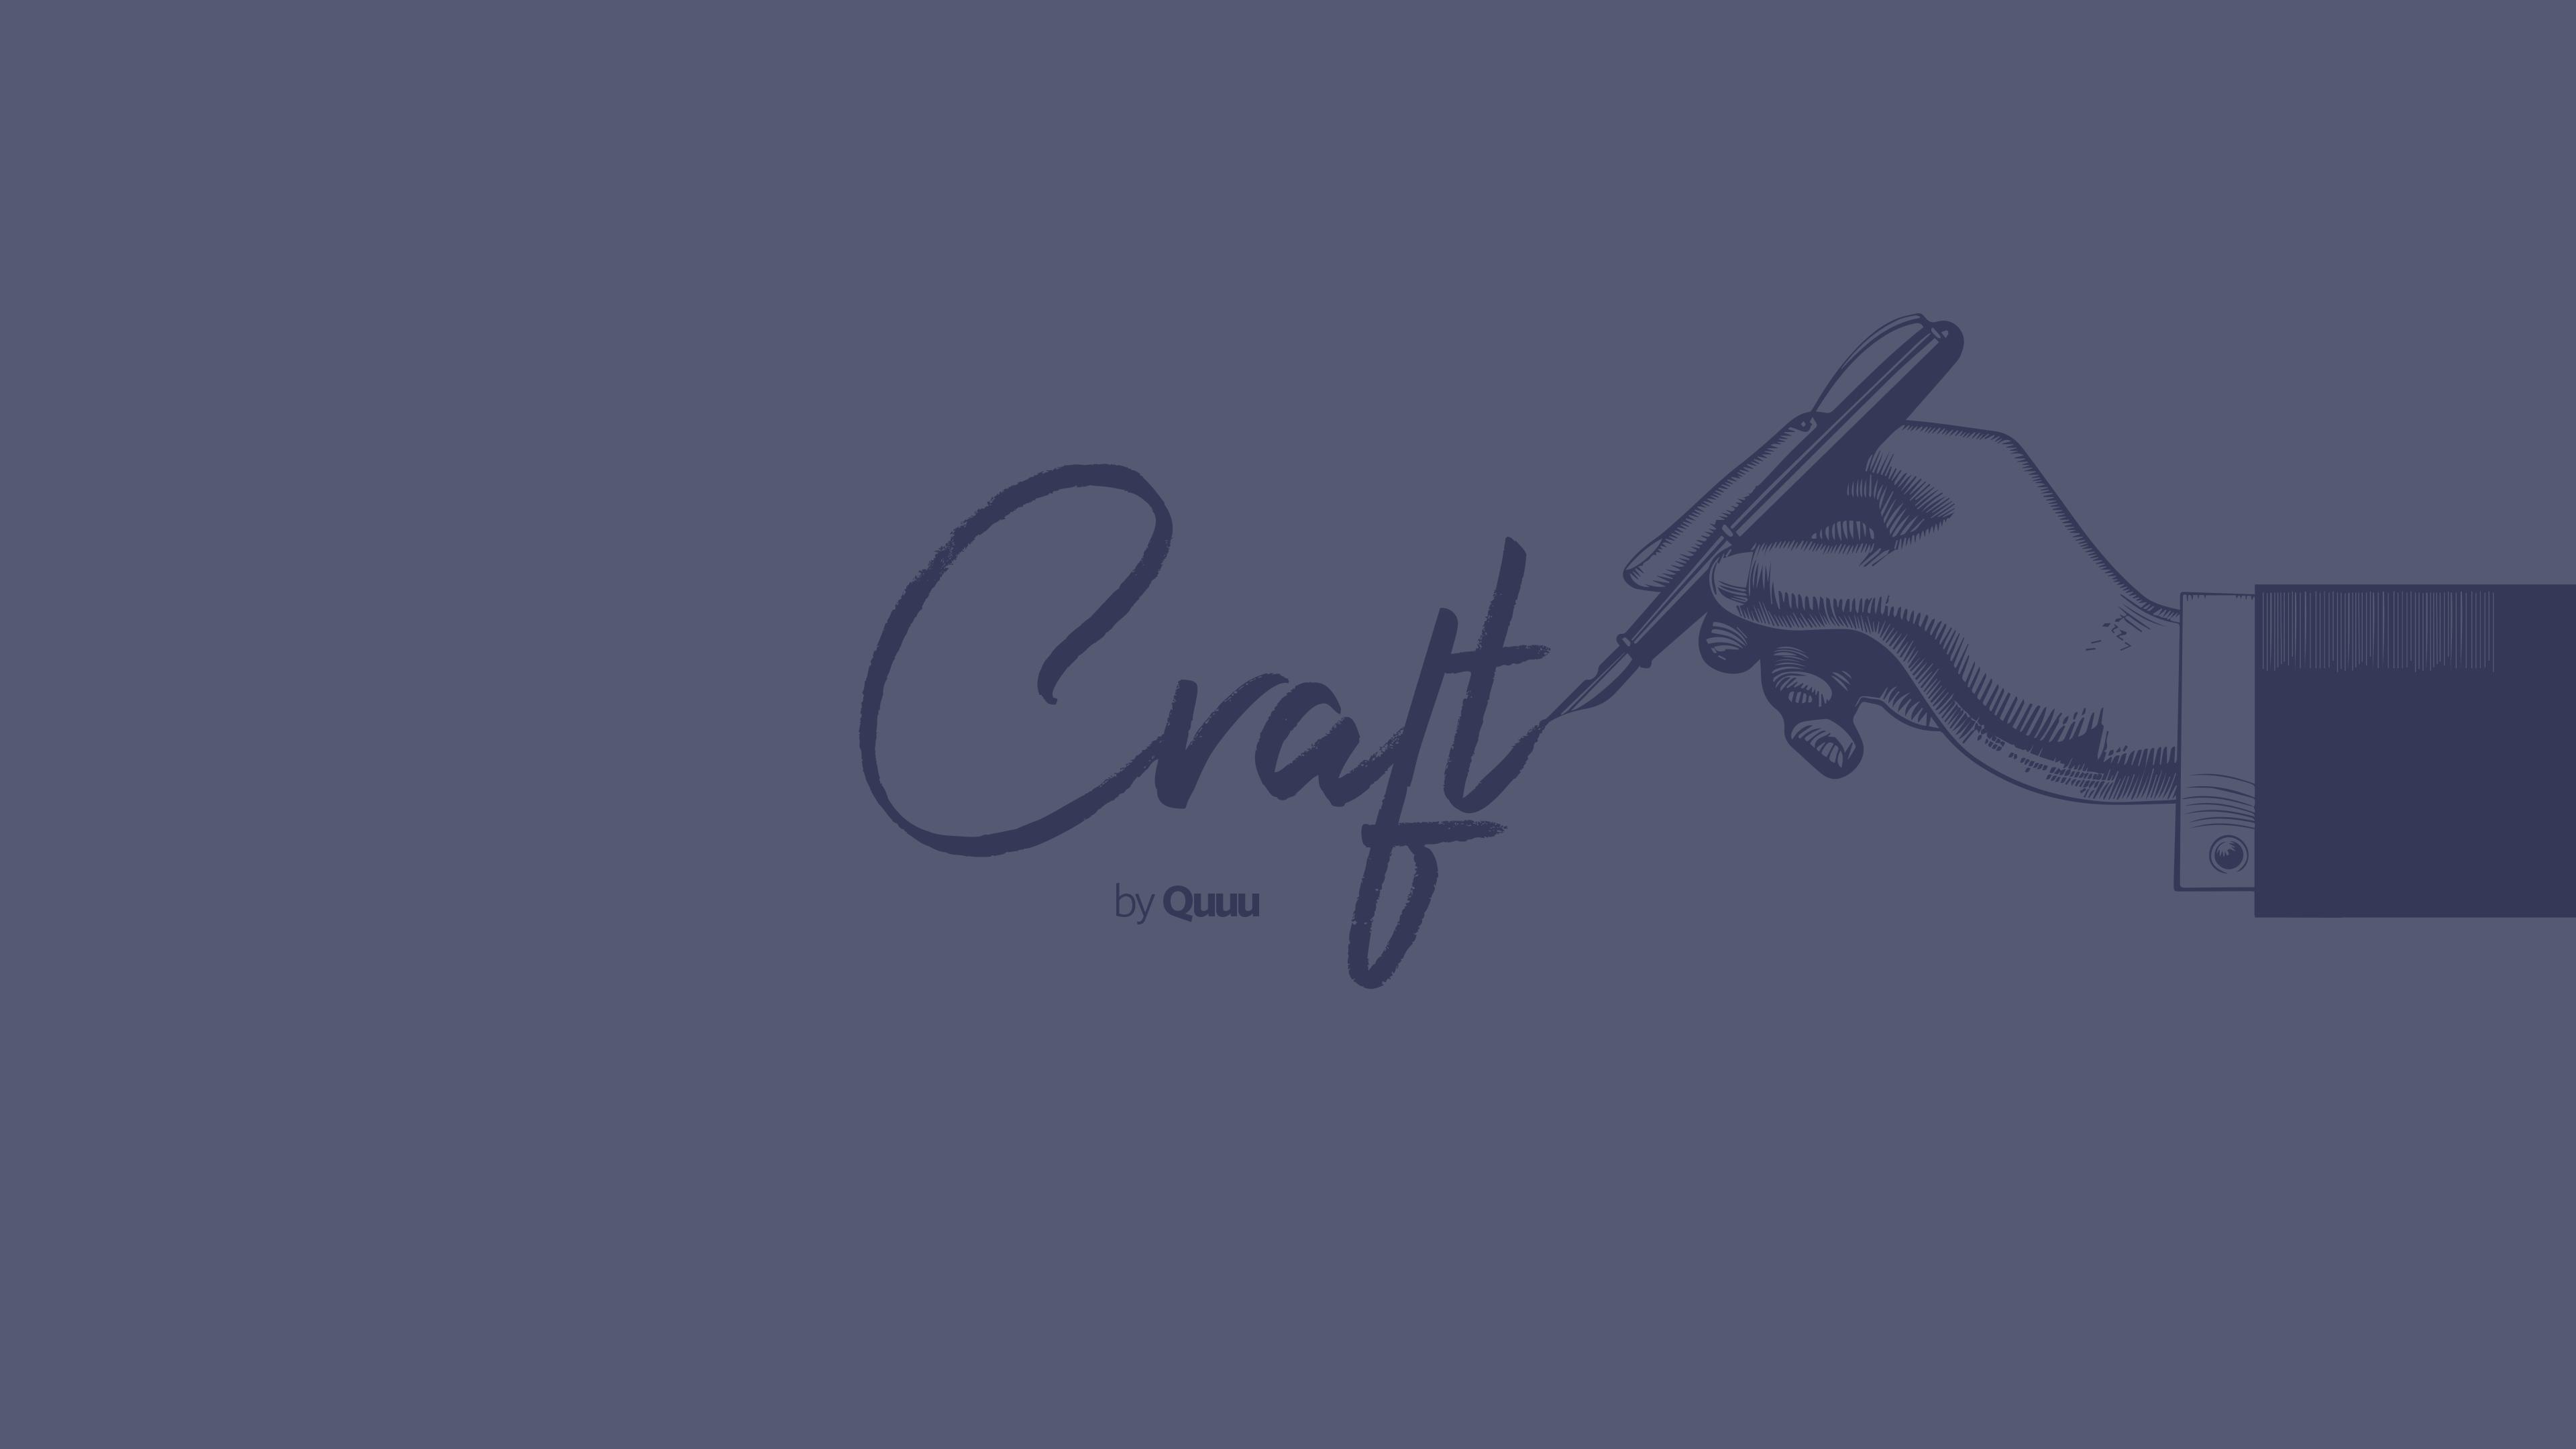 Craft by Quuu